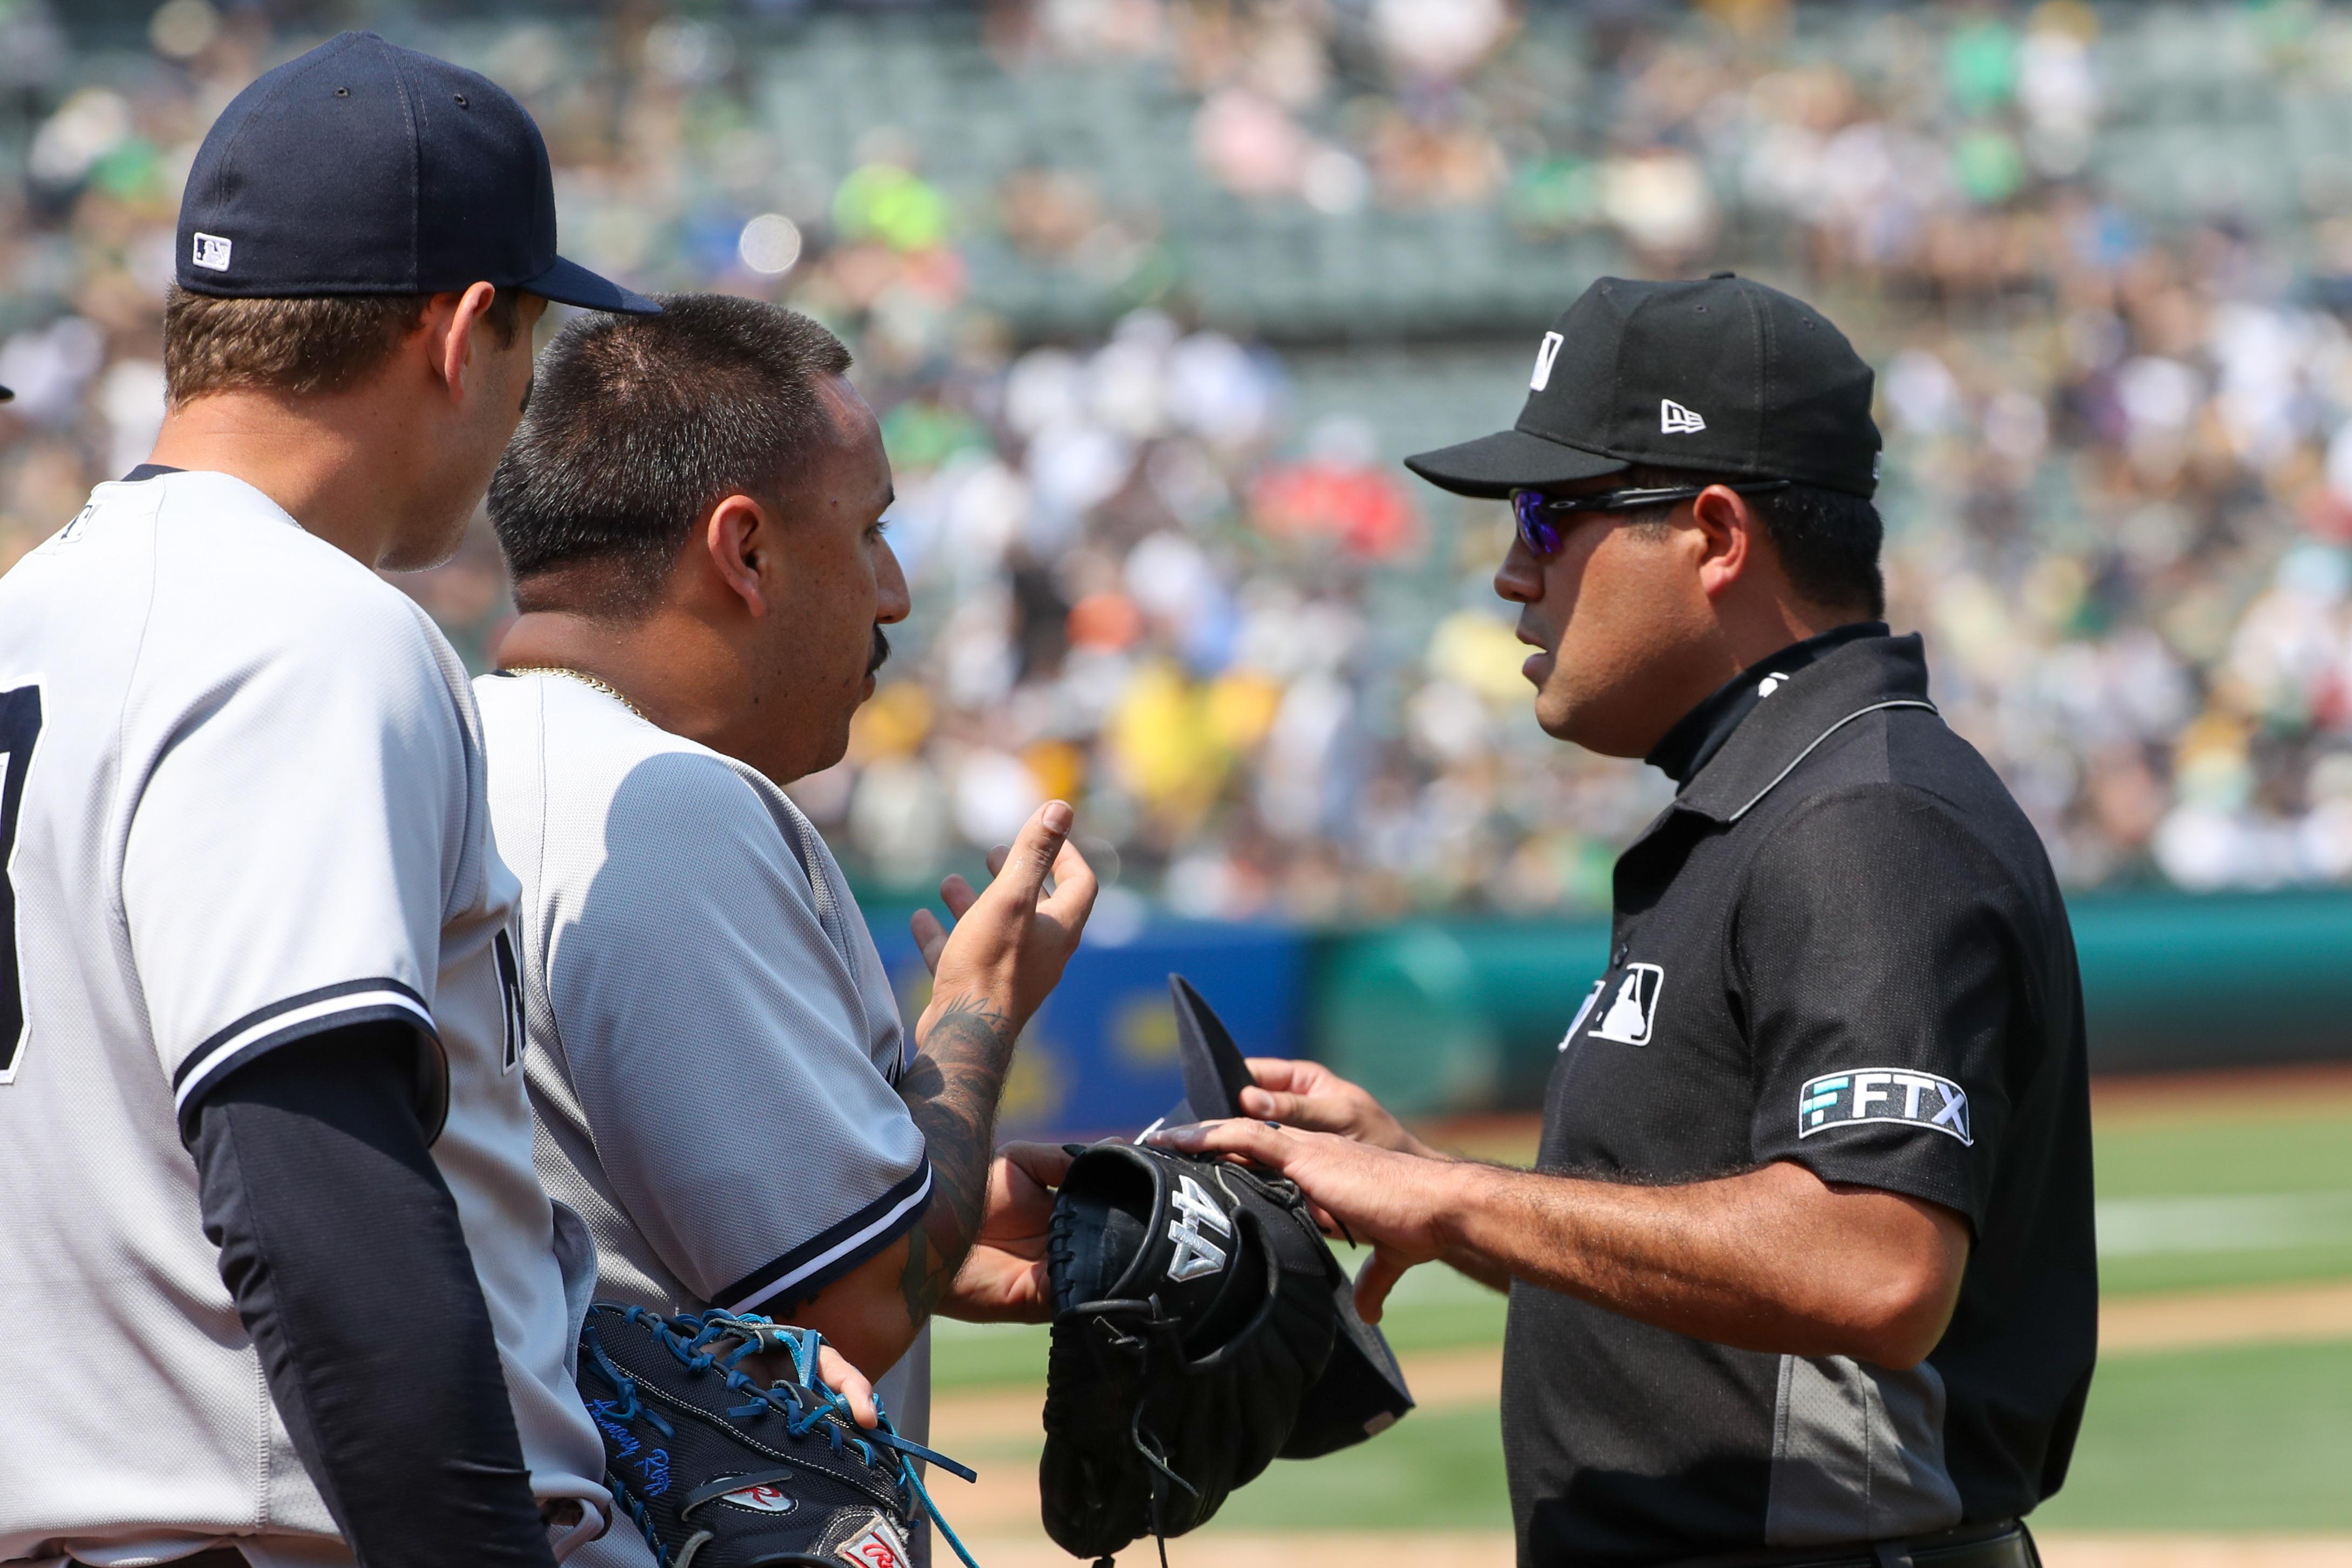 MLB: AUG 28 Yankees at Athletics